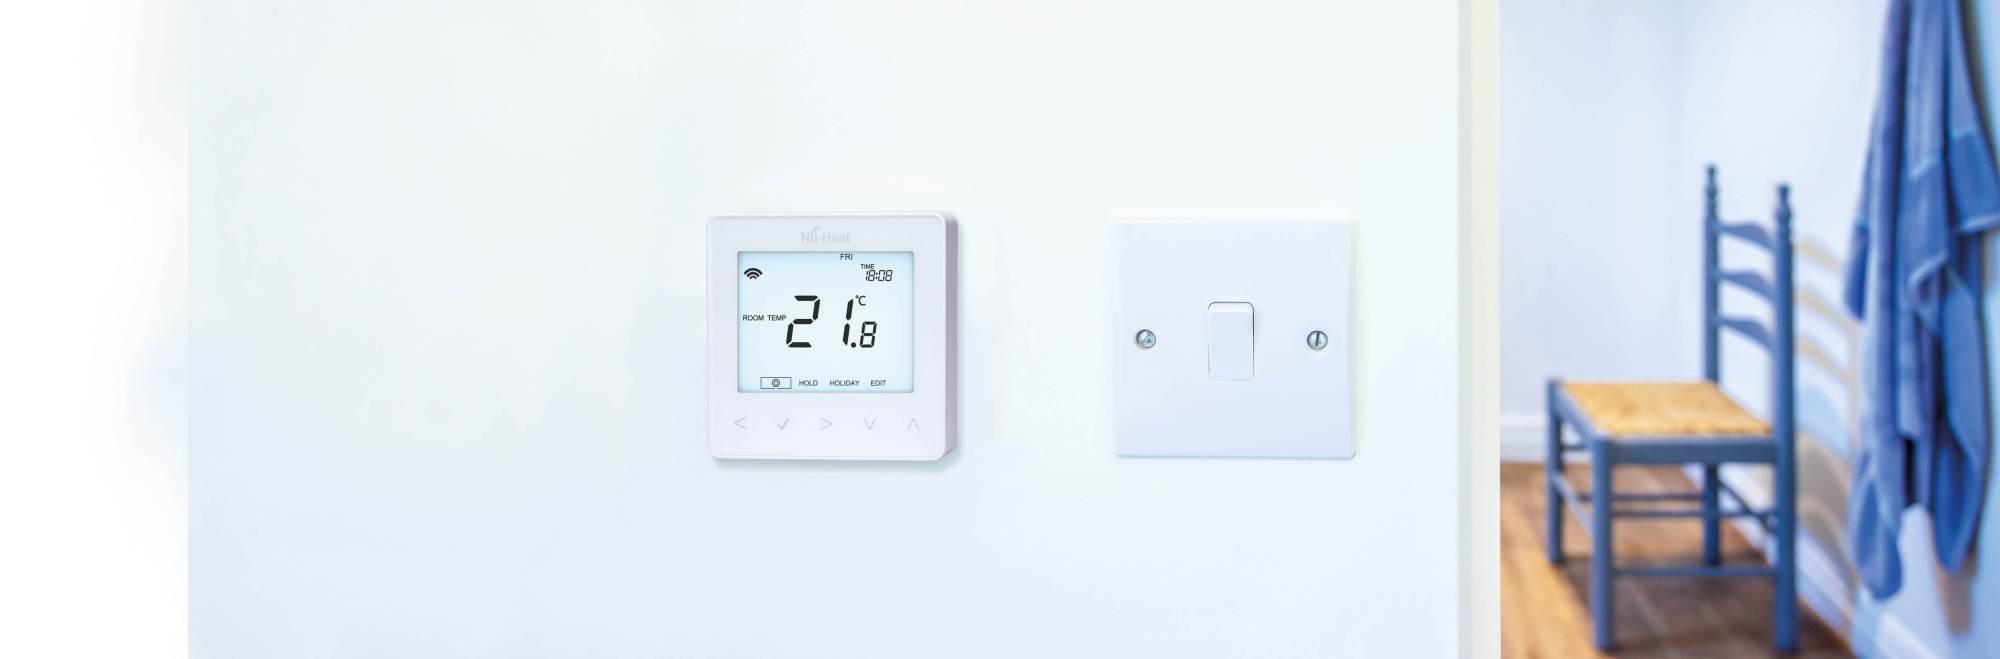 hight resolution of combi boiler with underfloor heating and radiator